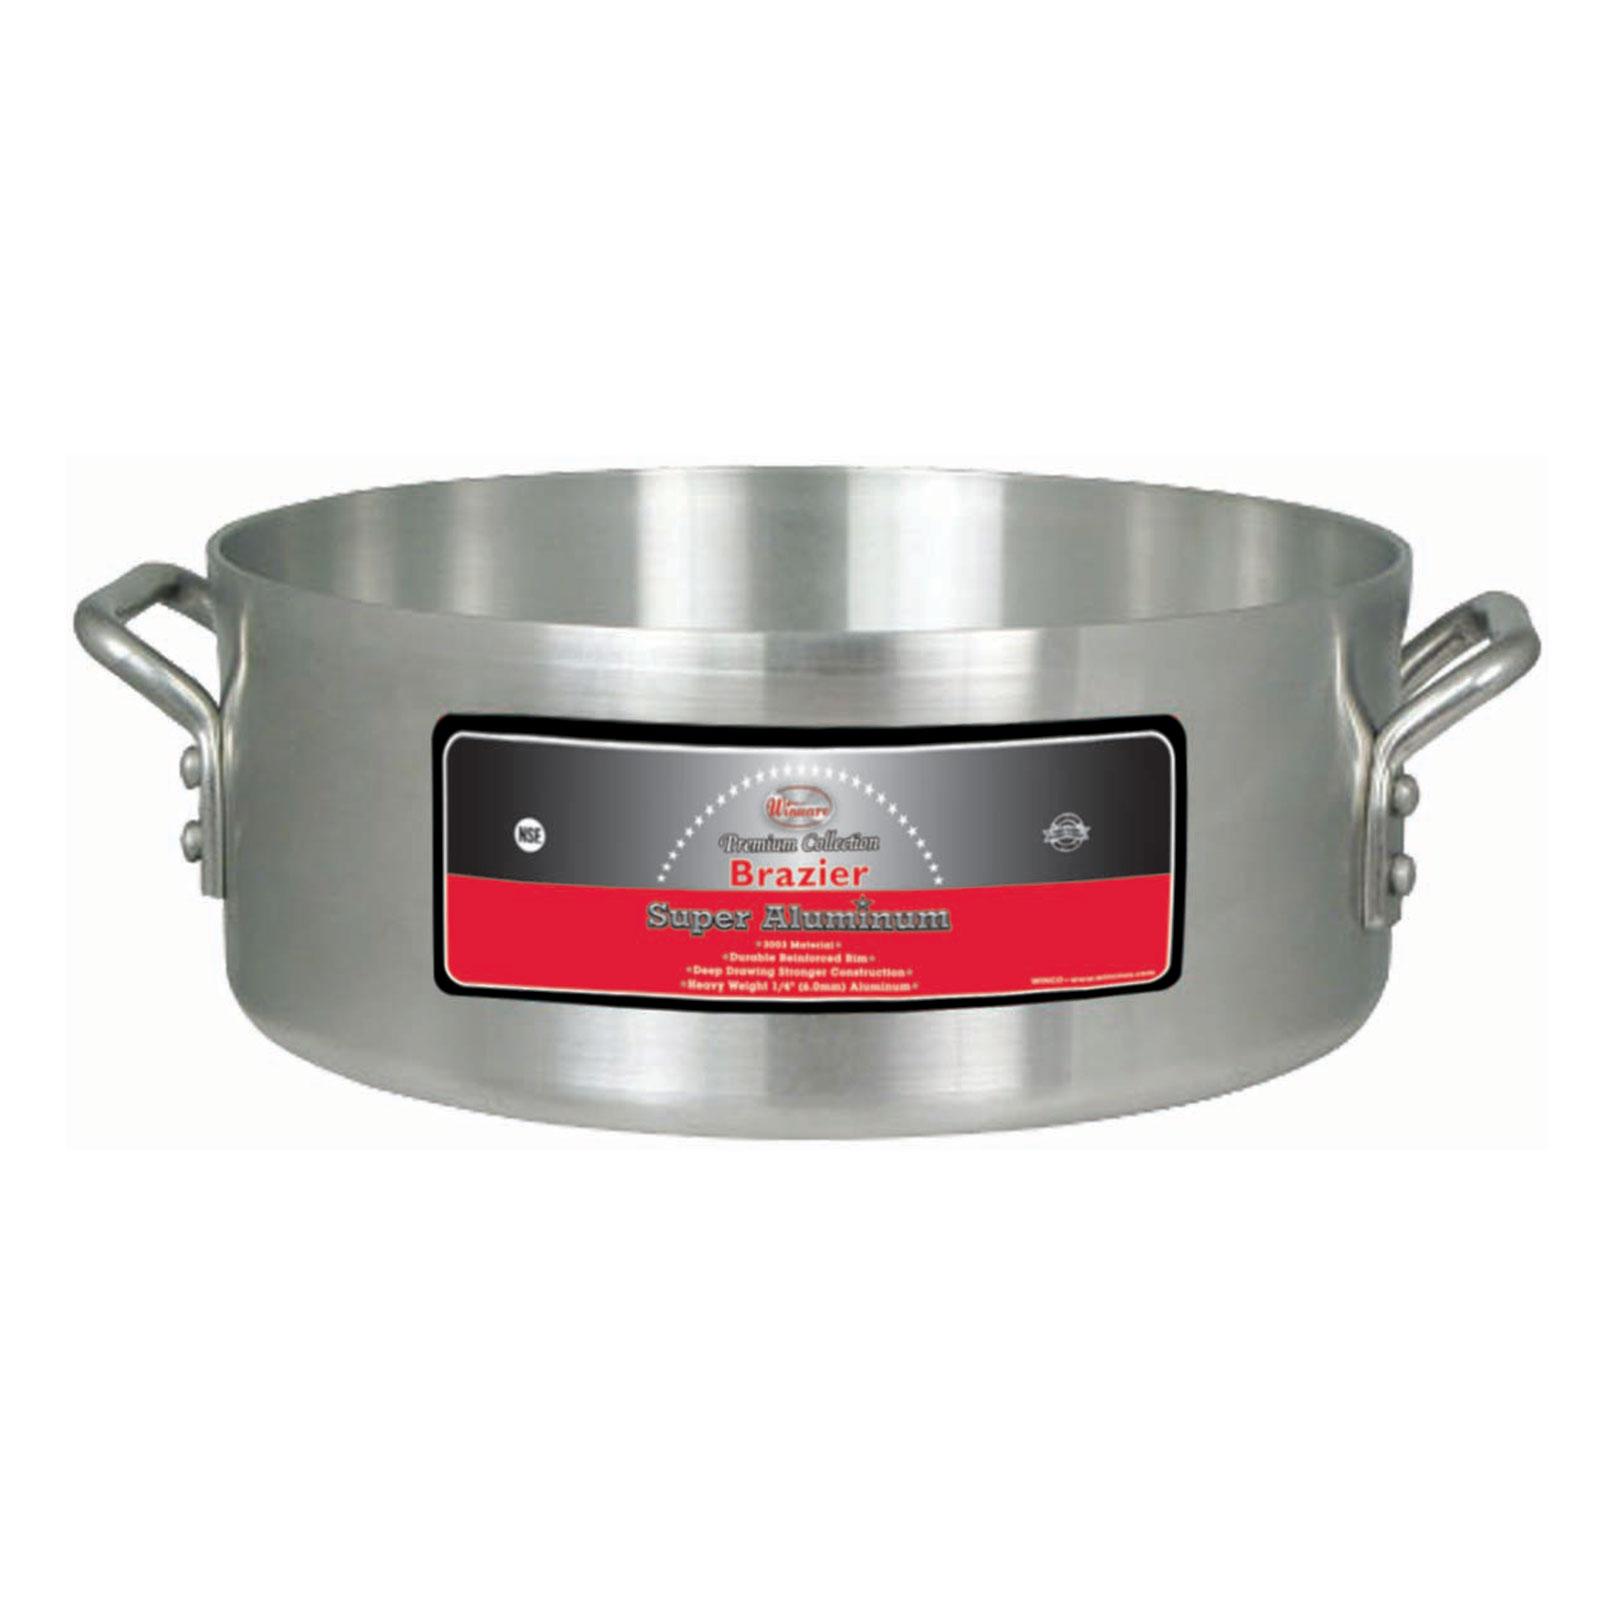 Winco AXHB-28 brazier pan